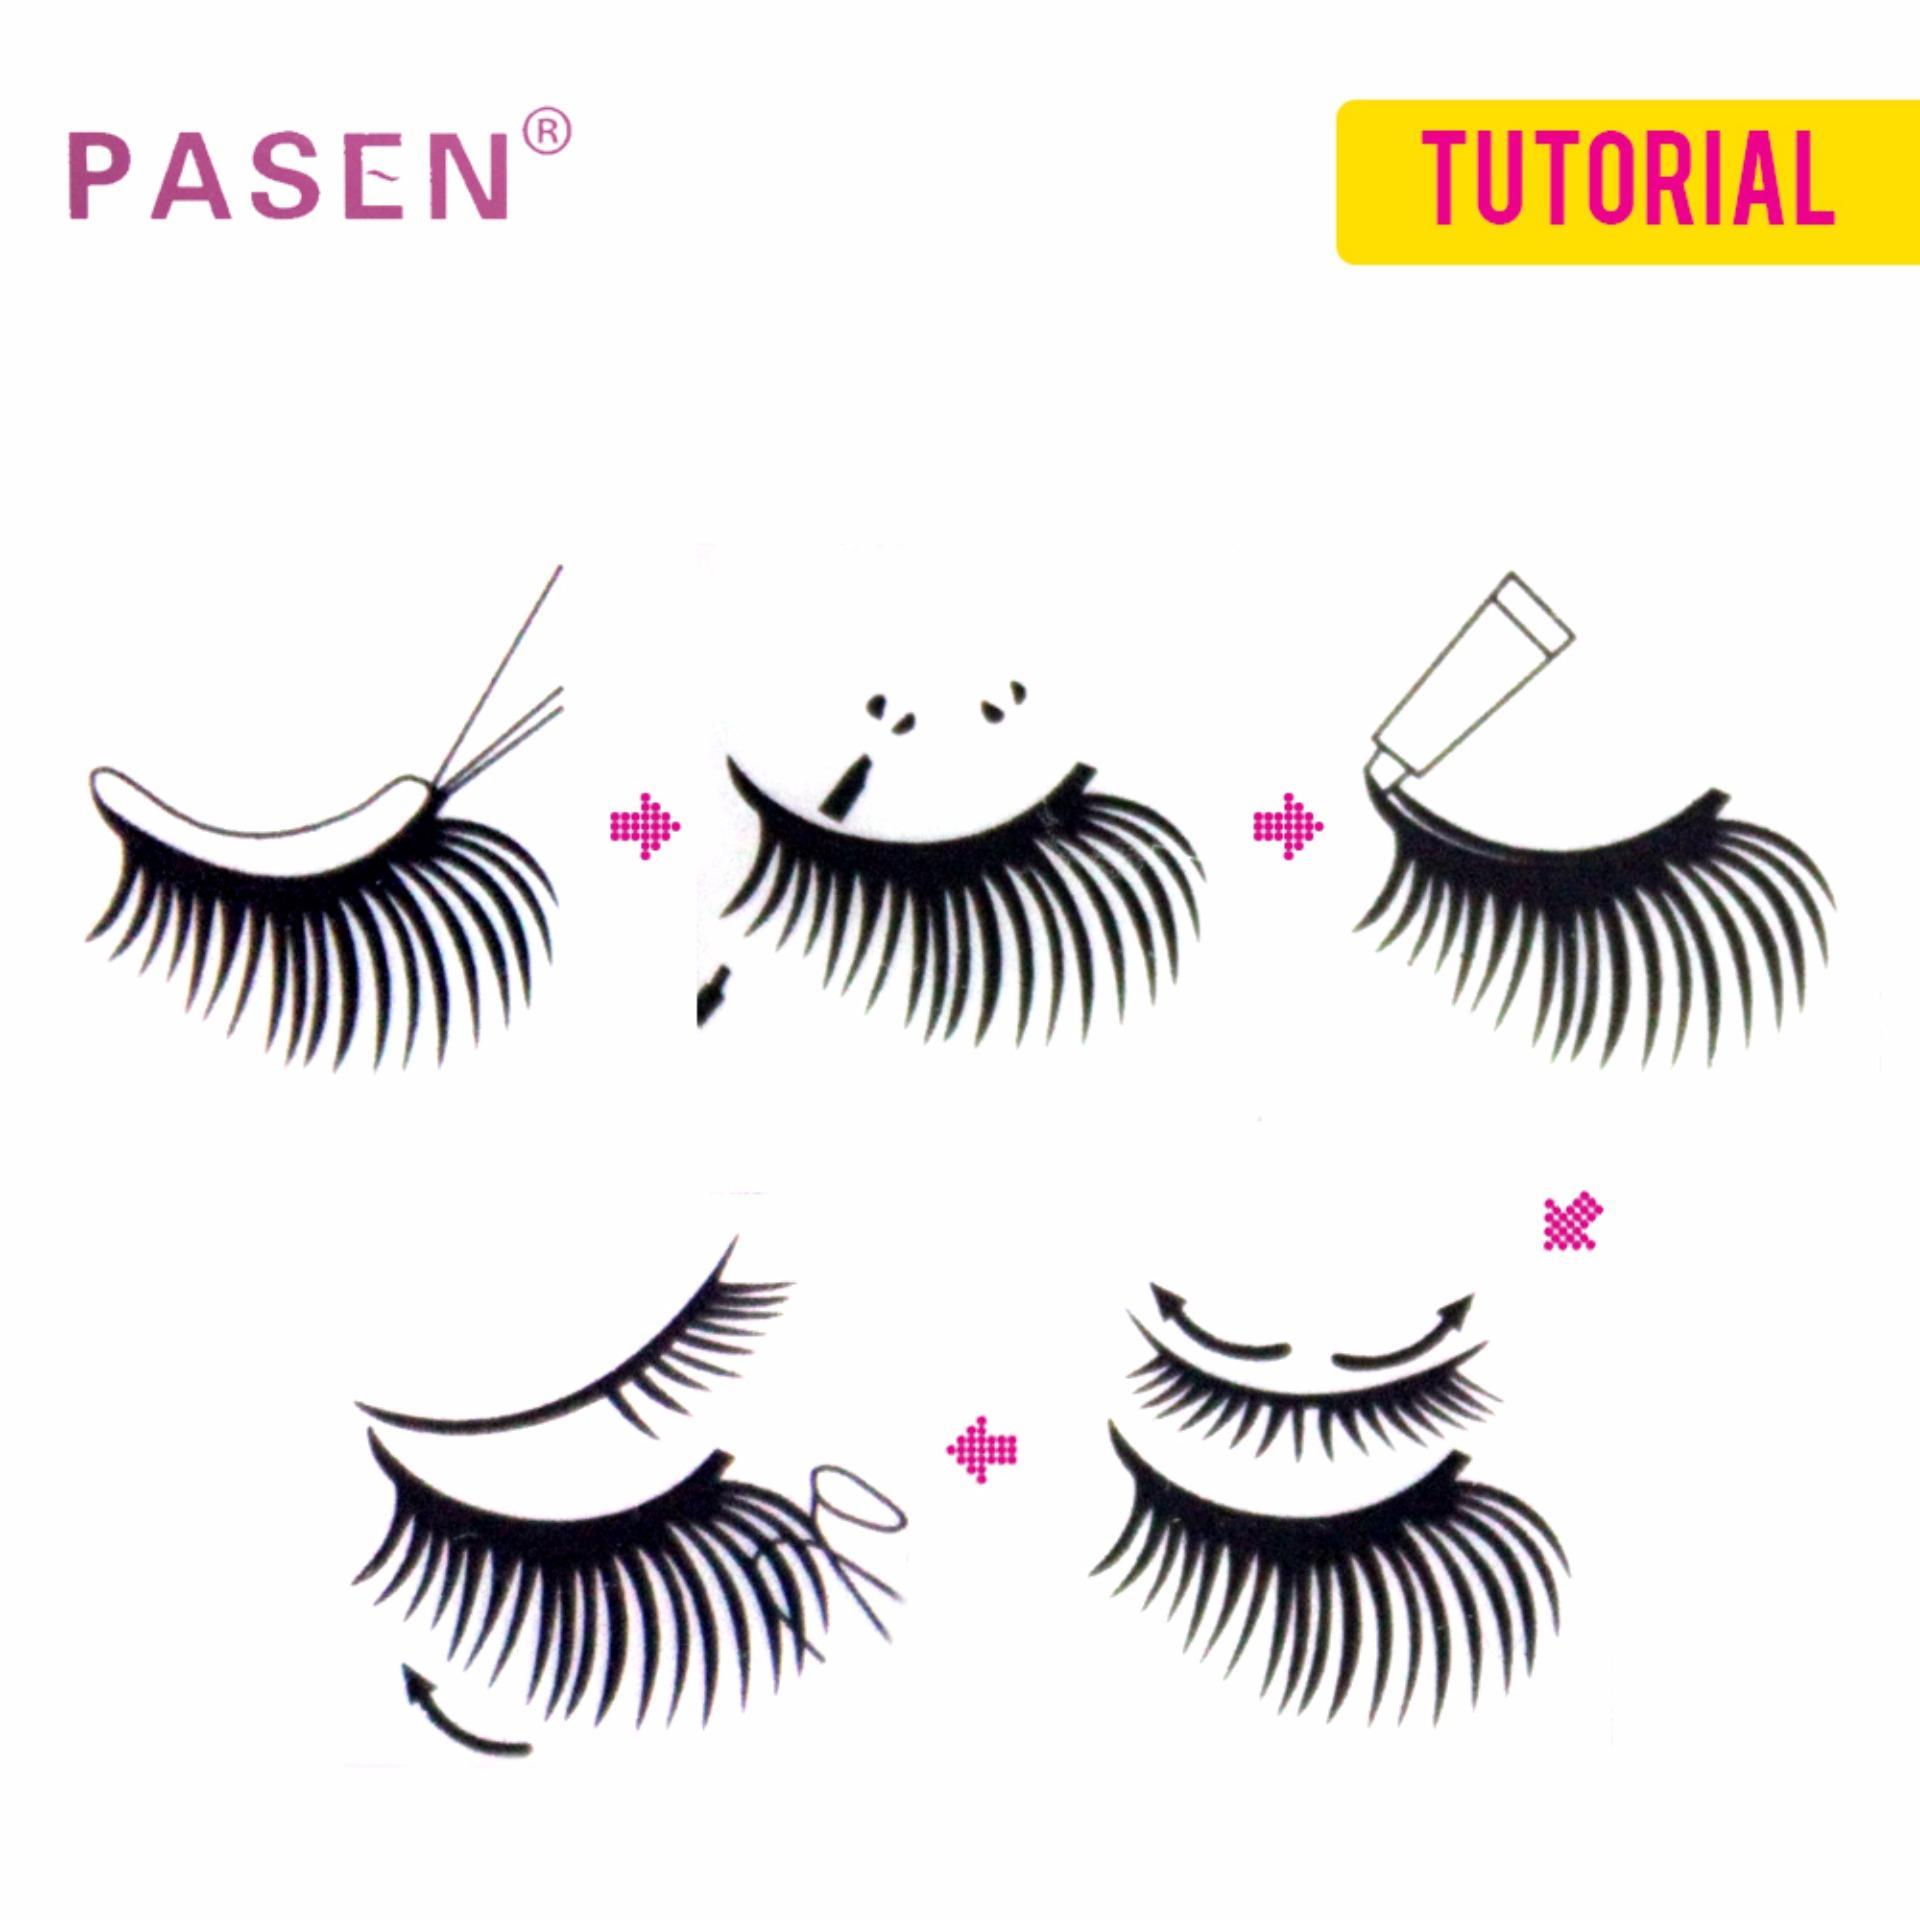 Bulumata Premium Lashine Carlotte False Eyelash Daftar Harga Bulu Mata Palsu Taiwan 217 Flase Pasen 16